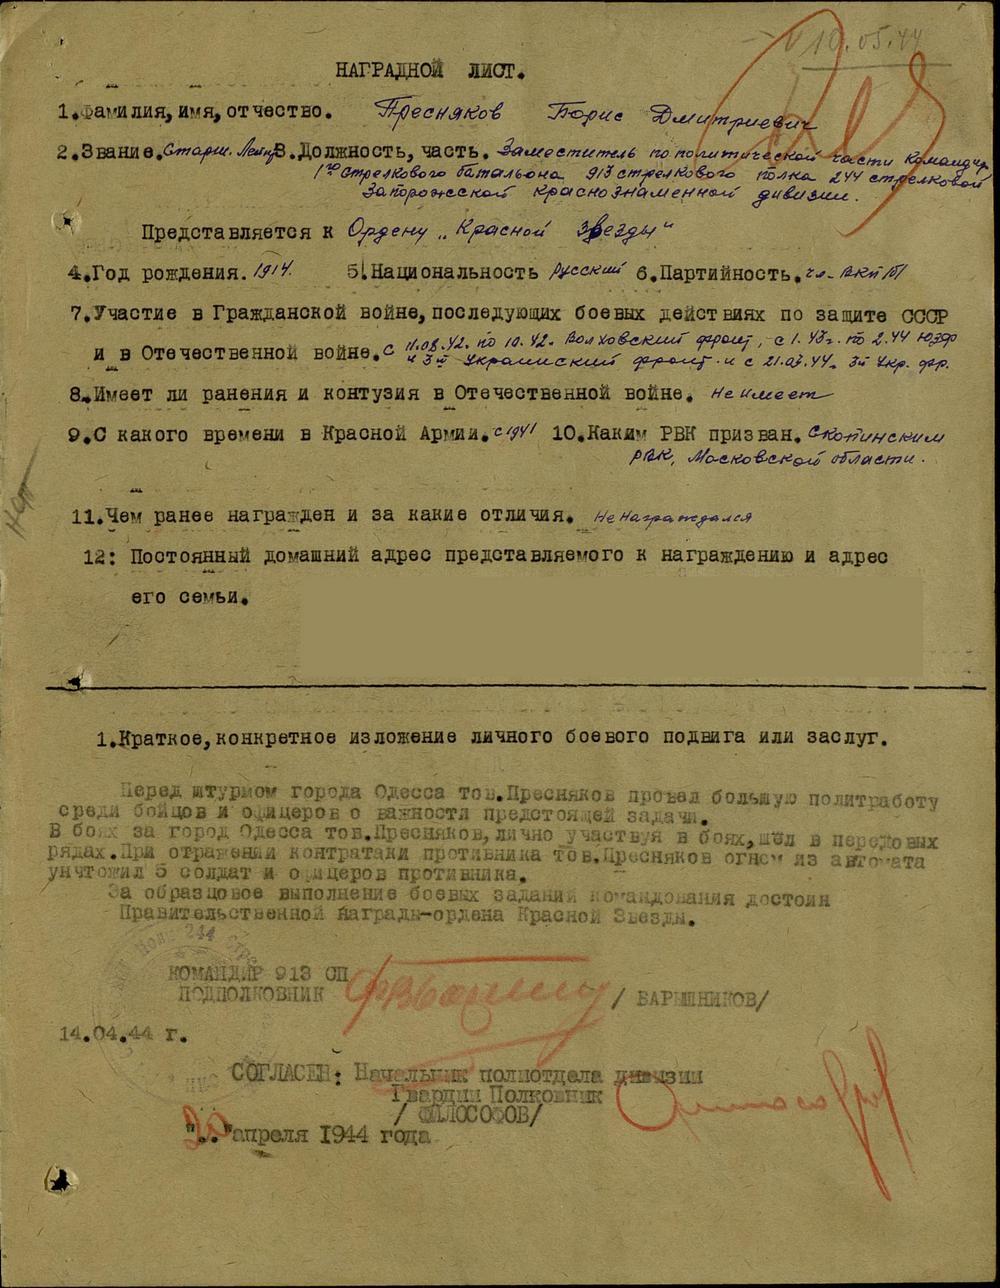 Наградной лист Бориса Преснякова.